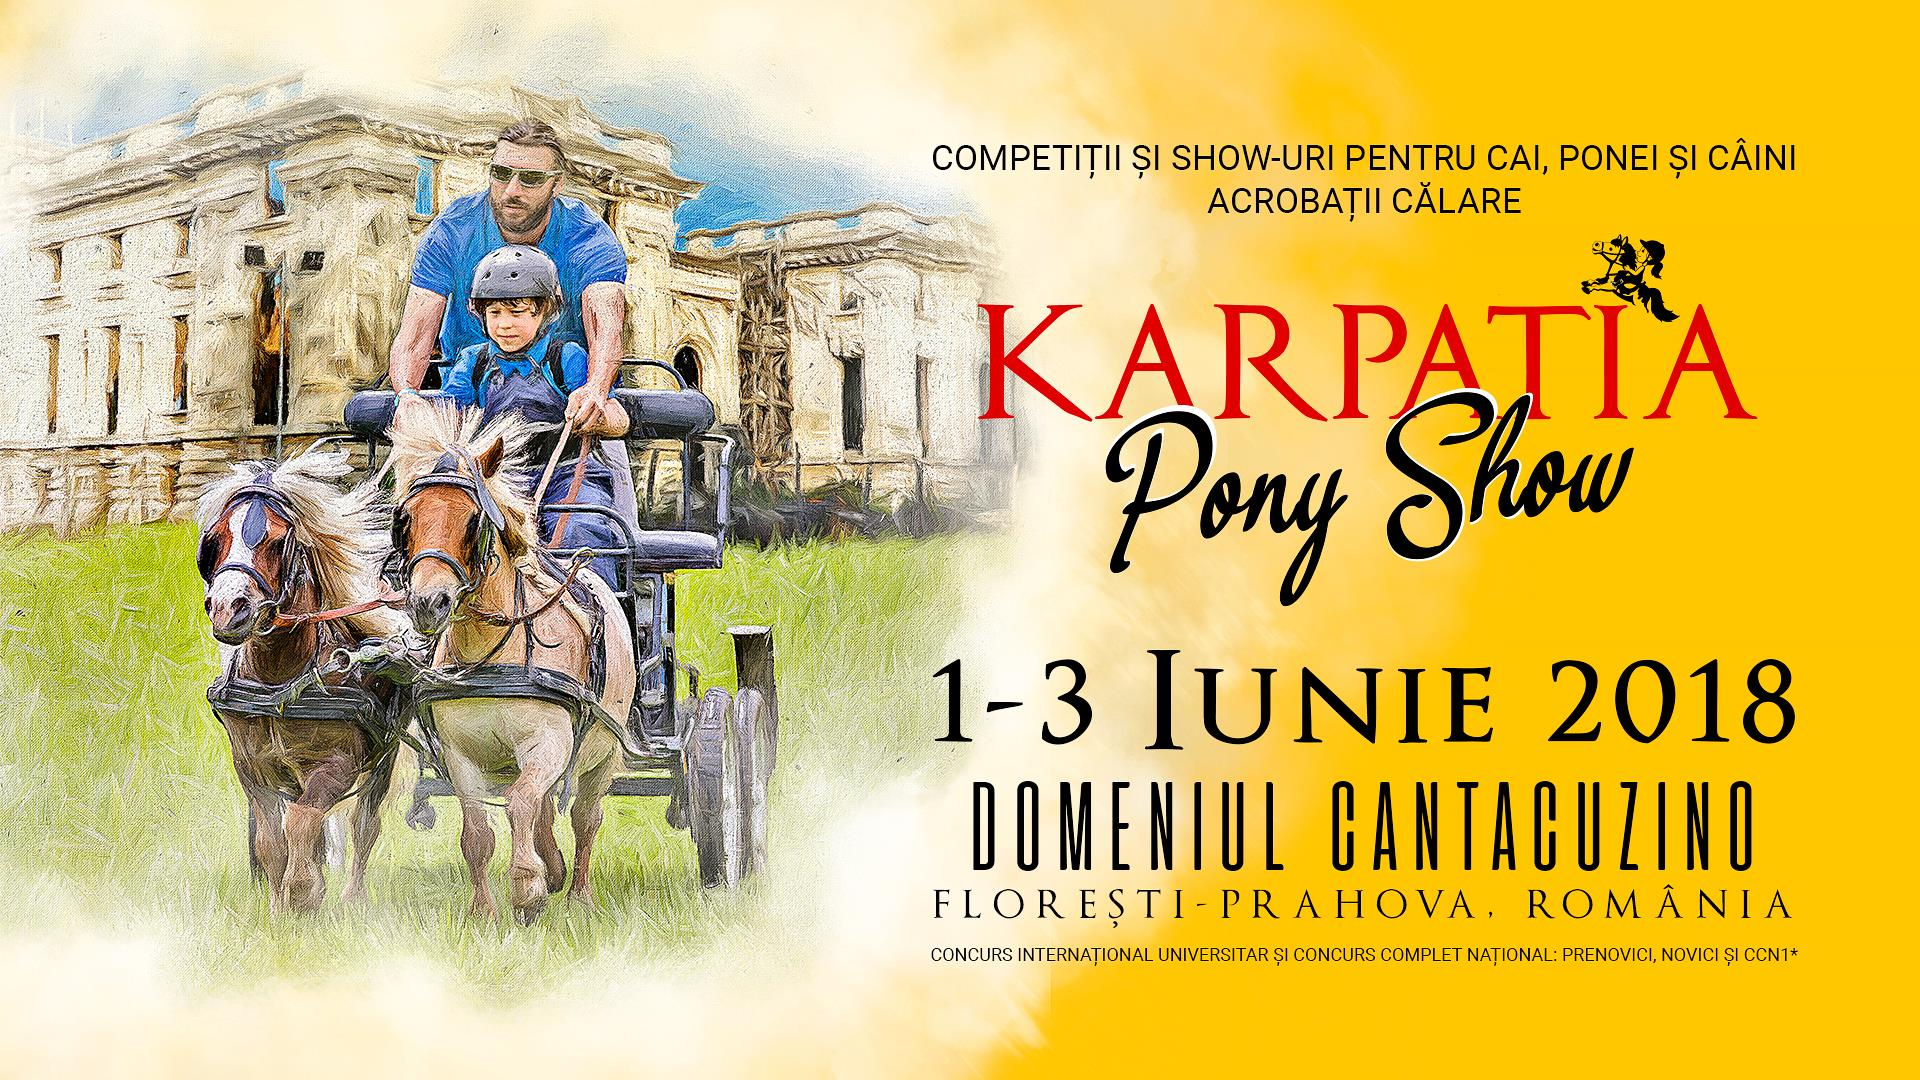 Karpatia Pony Show, 1-3 iunie 2018, Florești, jud. Prahova